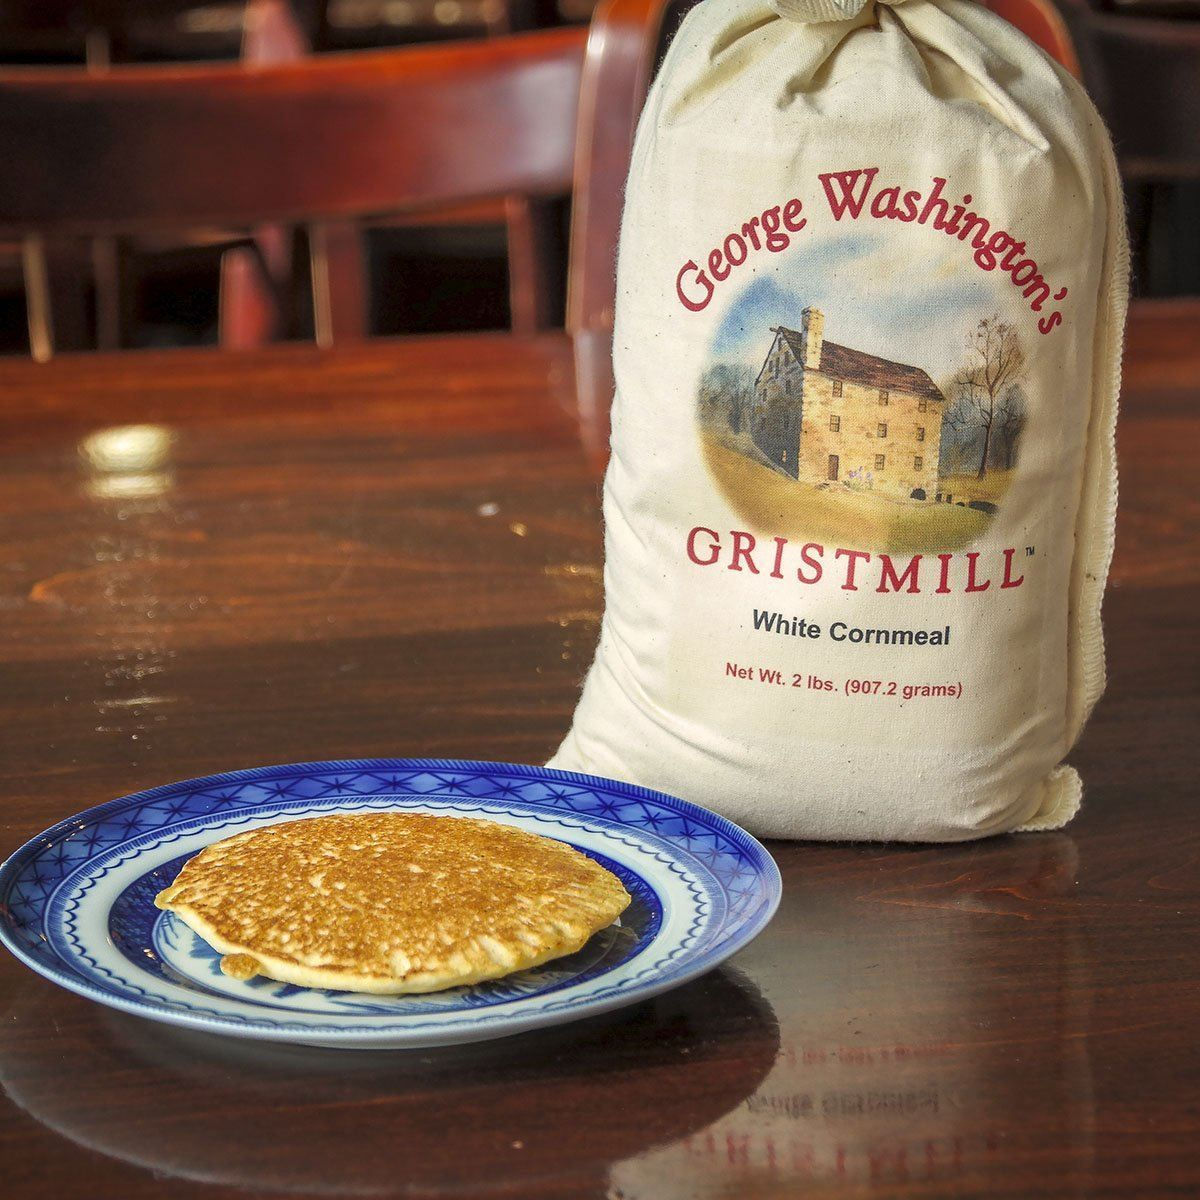 George Washington S White Cornmeal